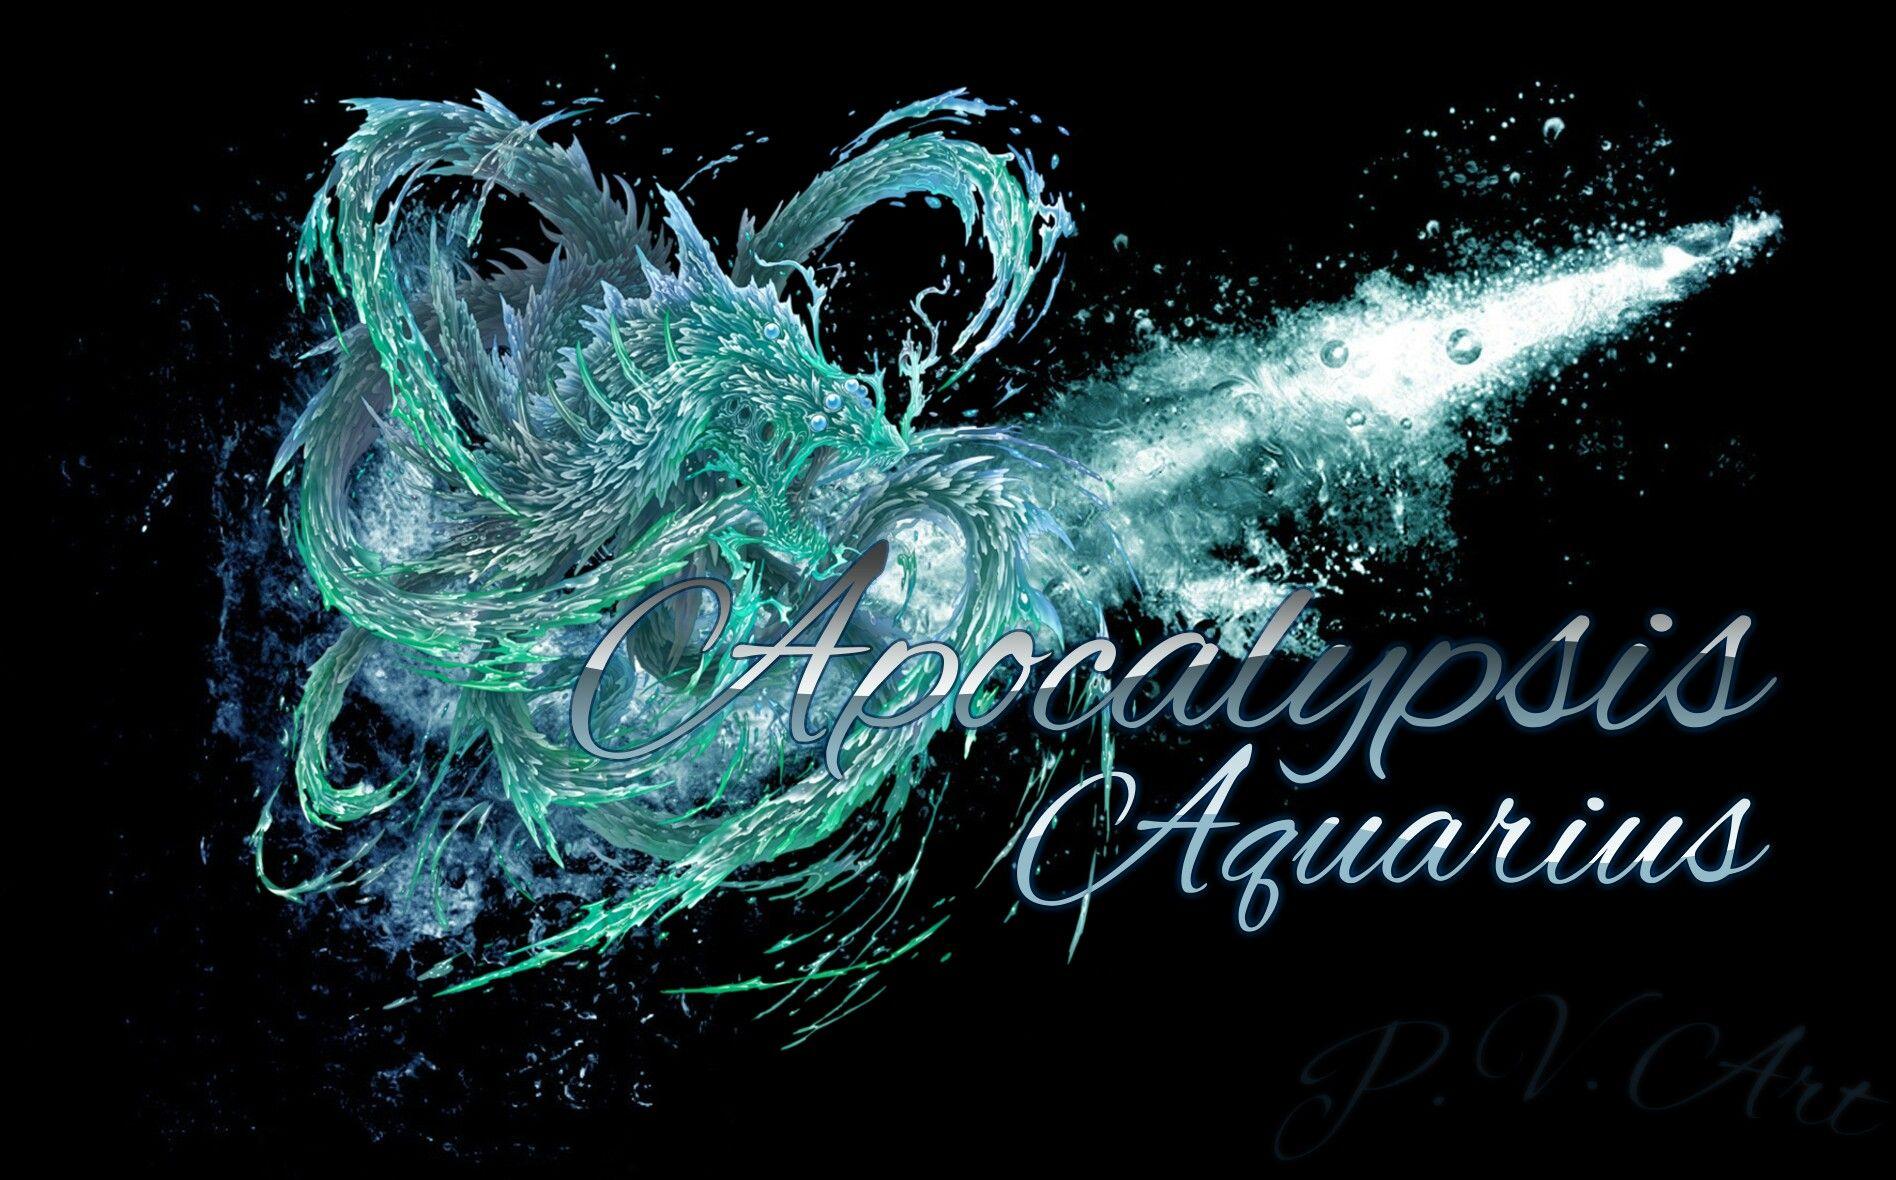 Apocalypsis Aquarius 2017 Wallpaper